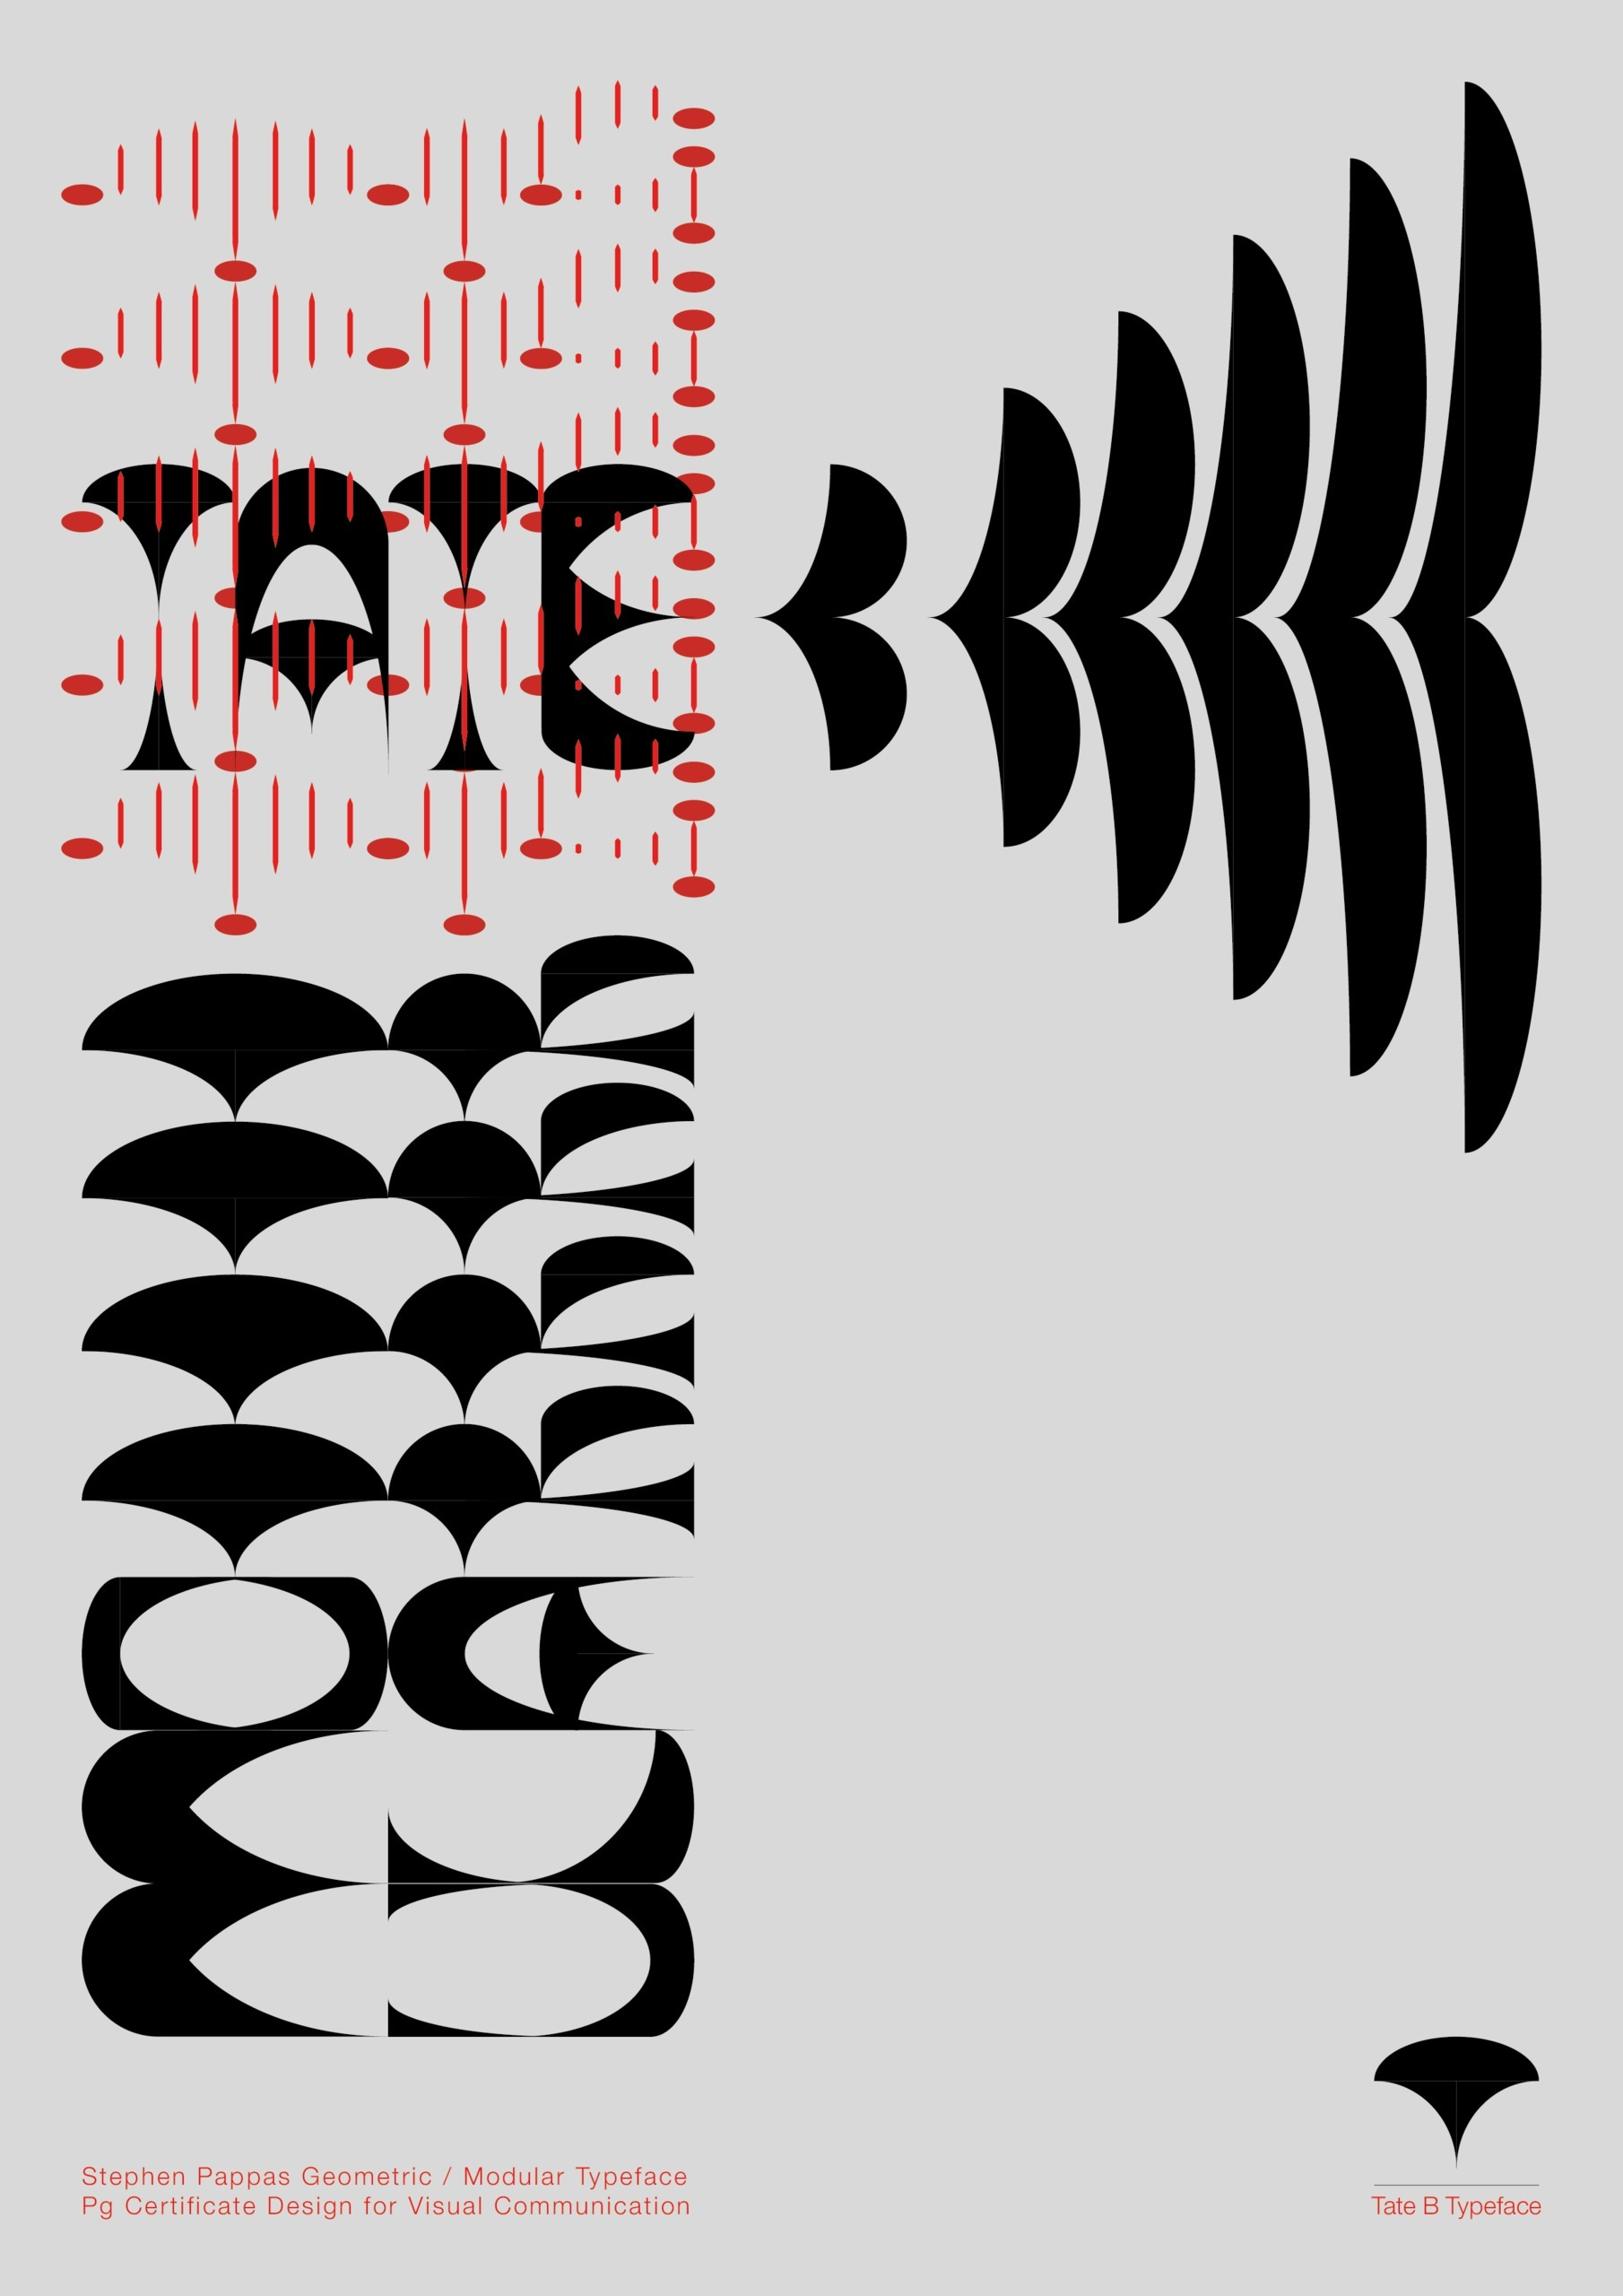 Tate Typeface - Digital Book Co - stephenpappas | ello